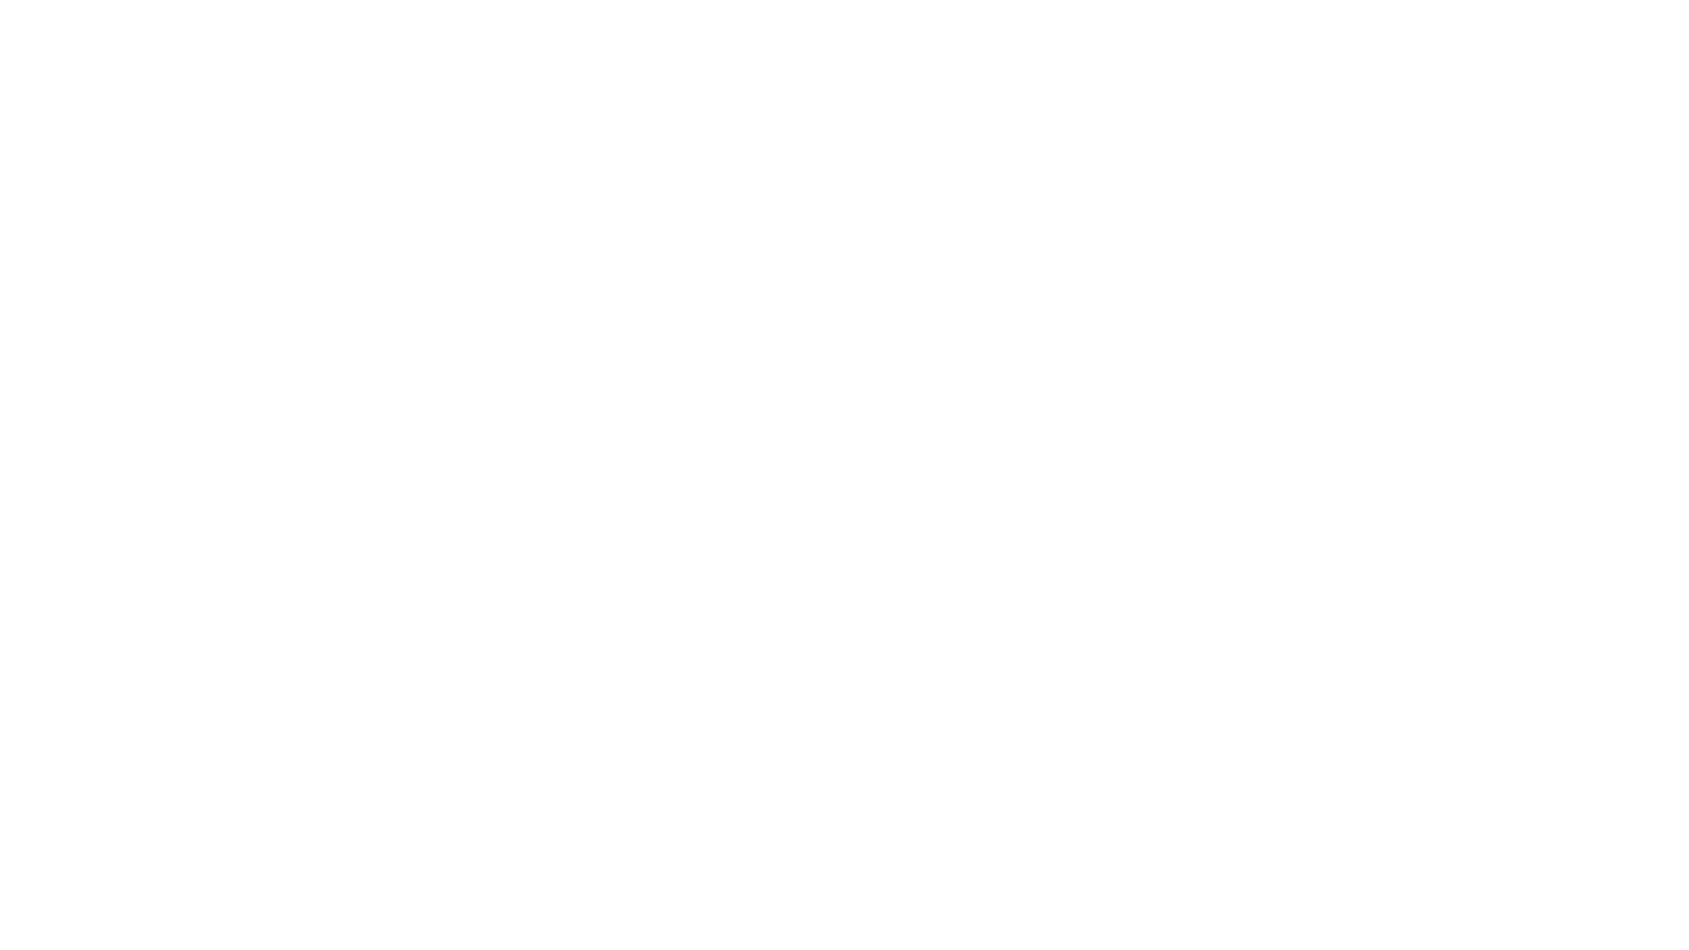 QUEST CRYPTO